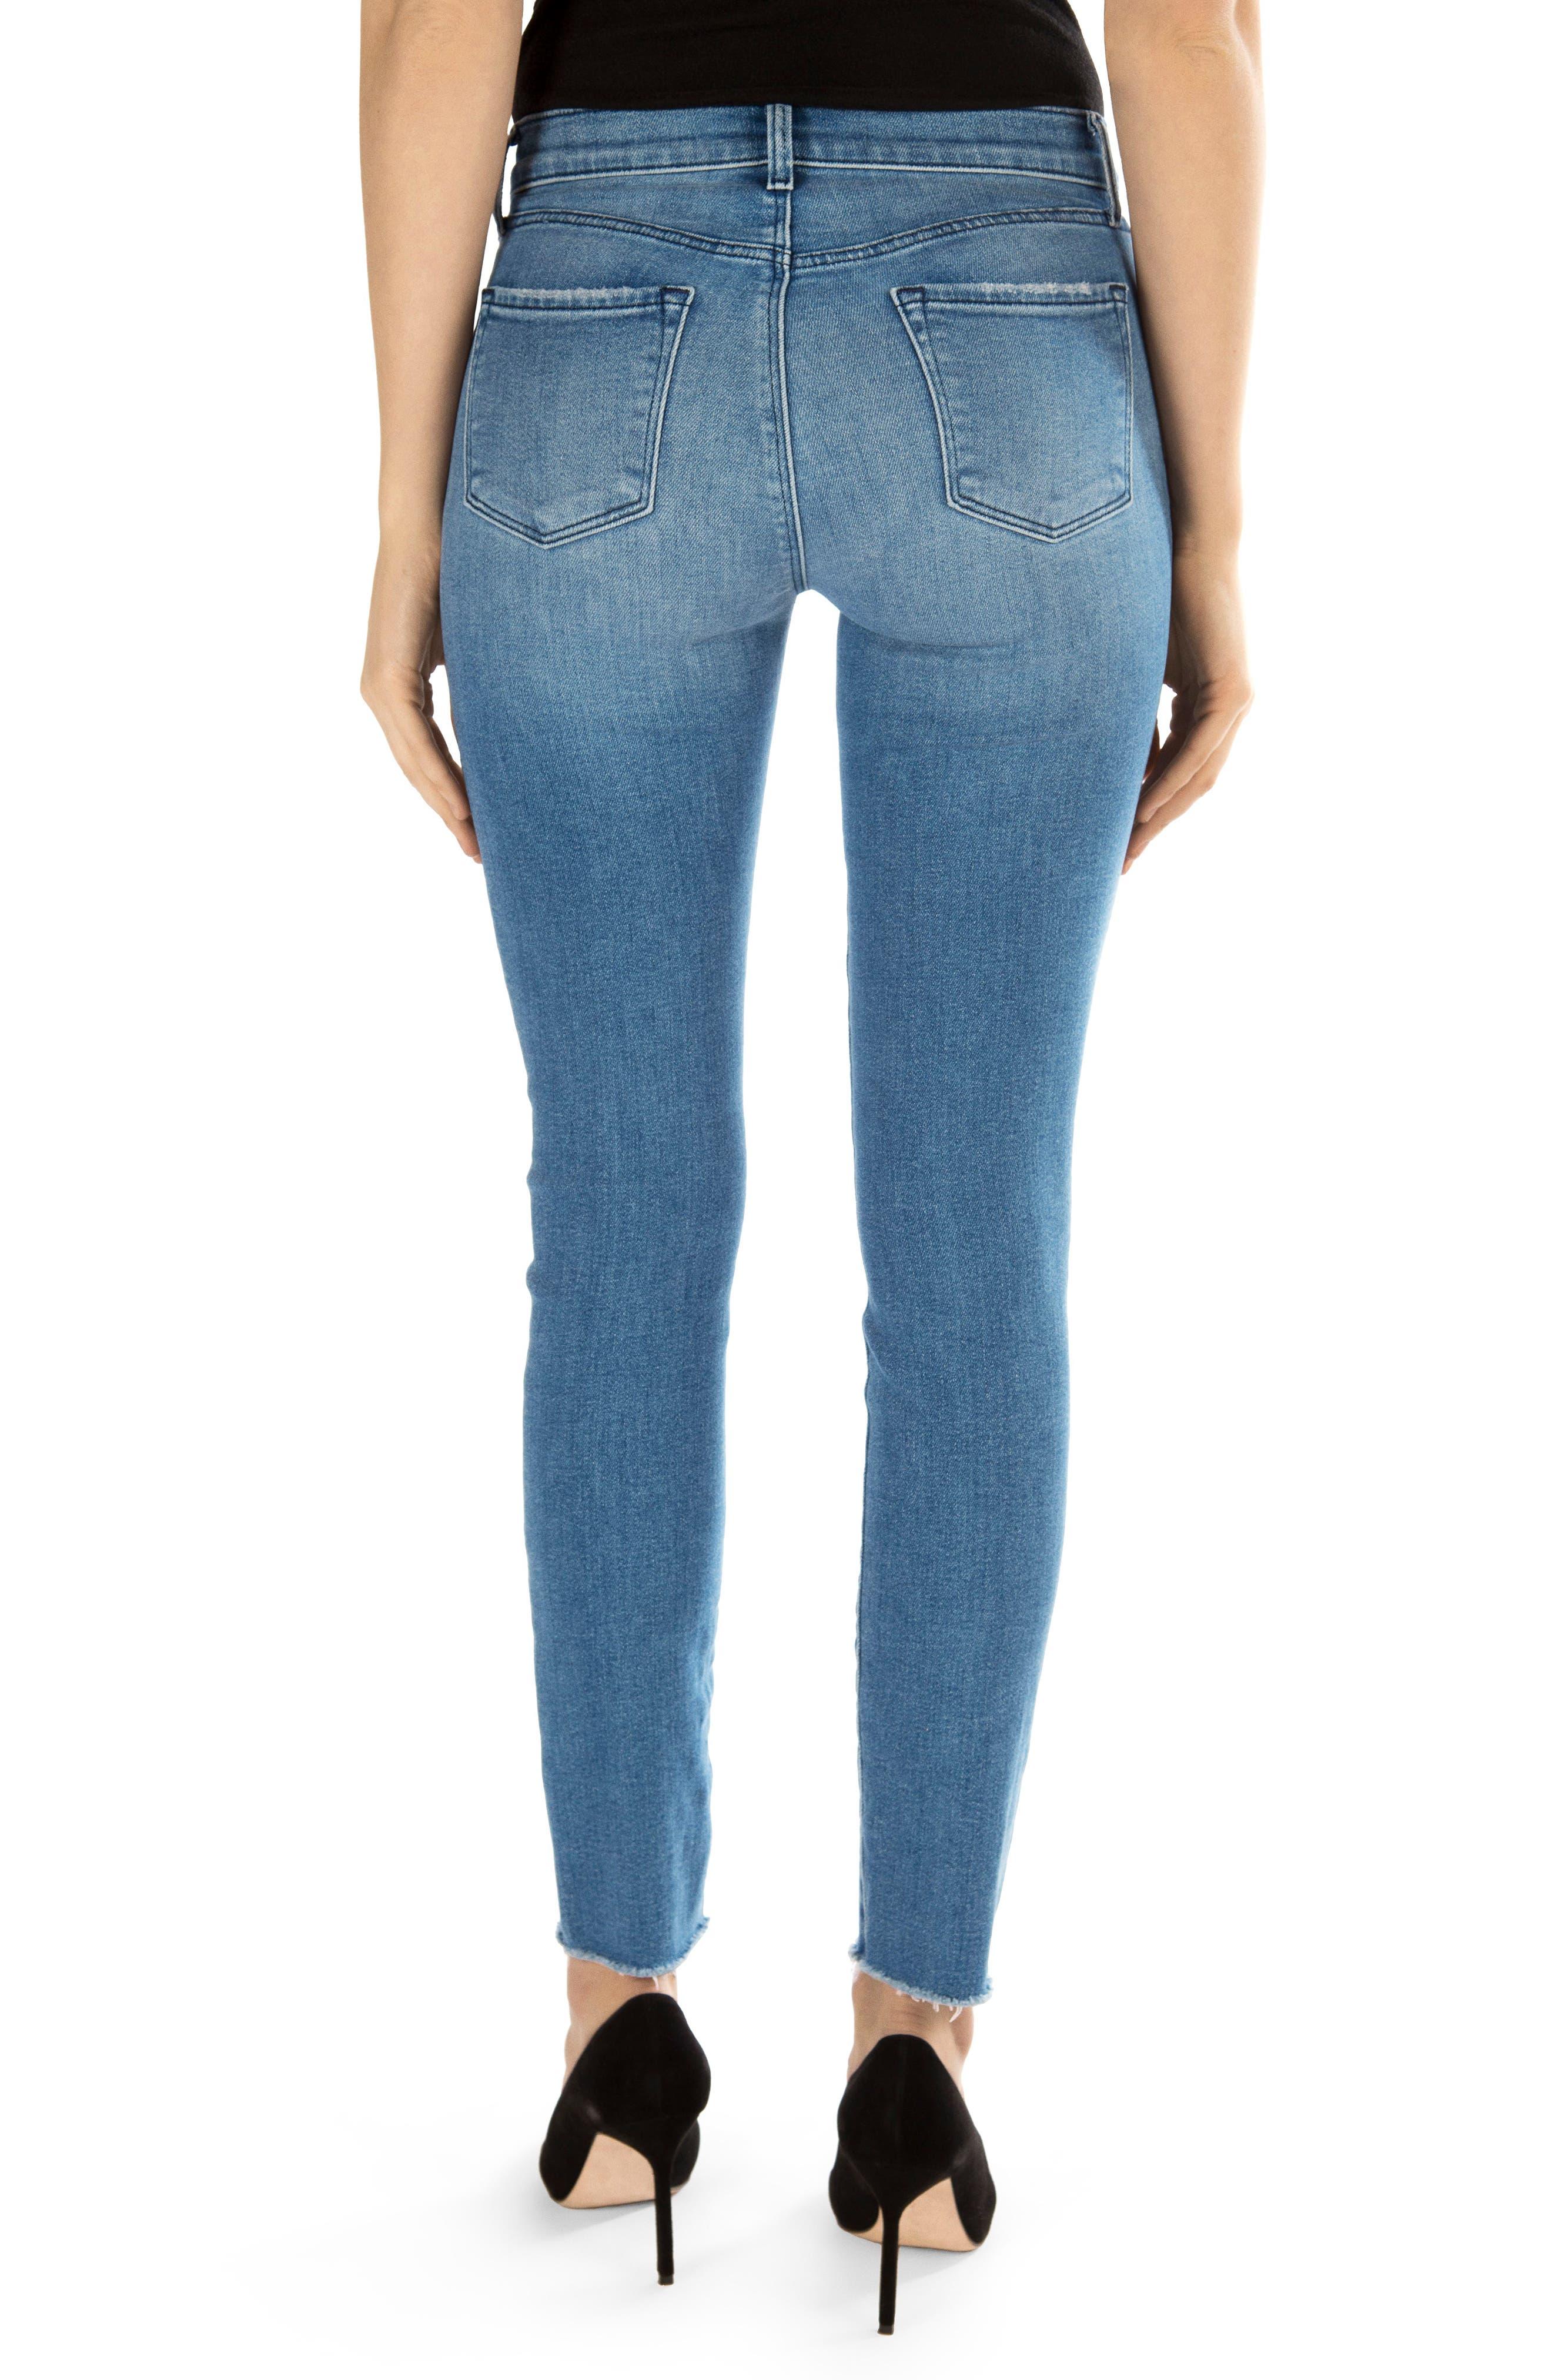 811 Raw Hem Ankle Skinny Jeans,                             Alternate thumbnail 2, color,                             457